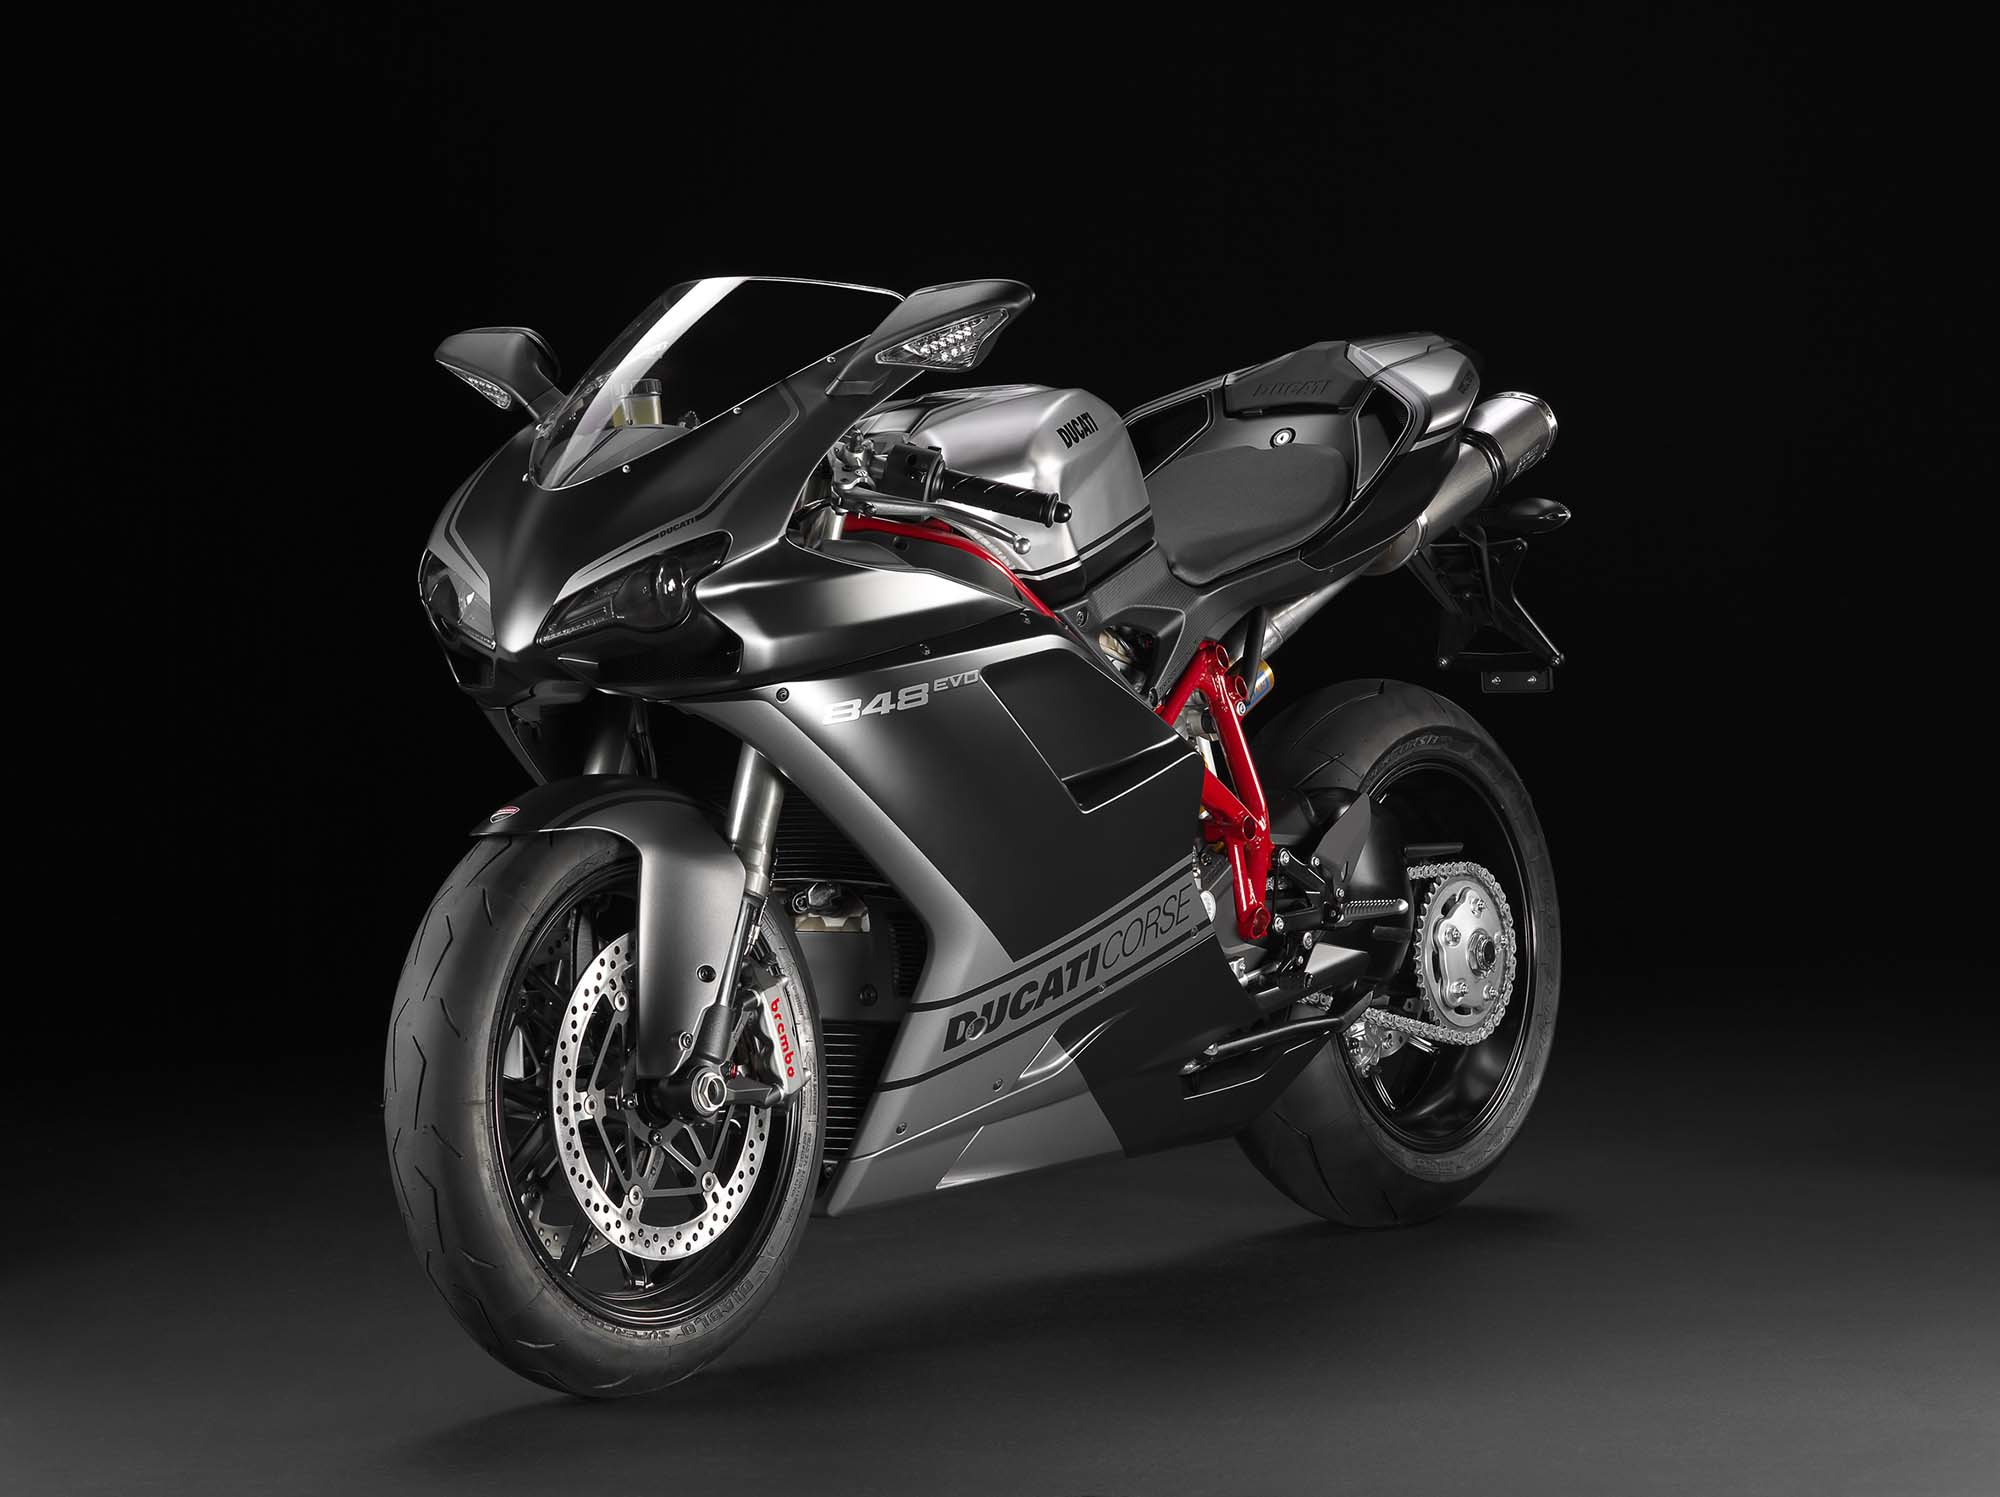 2013 Ducati Superbike 848 EVO Corse SE - Asphalt & Rubber